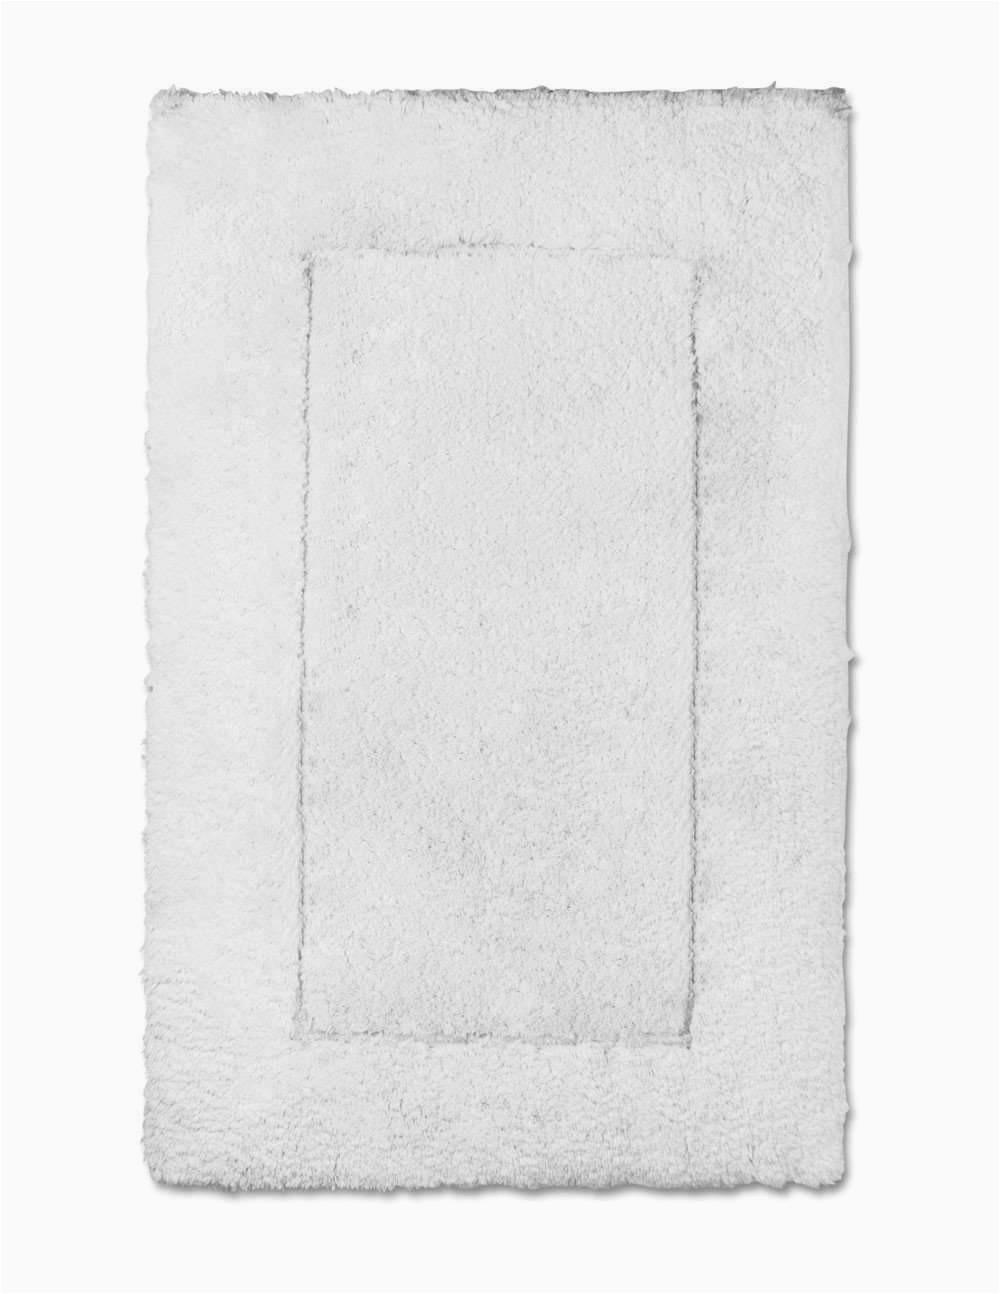 Black Cotton Bath Rug Eclisarre Egyptian Cotton Bath Rugs